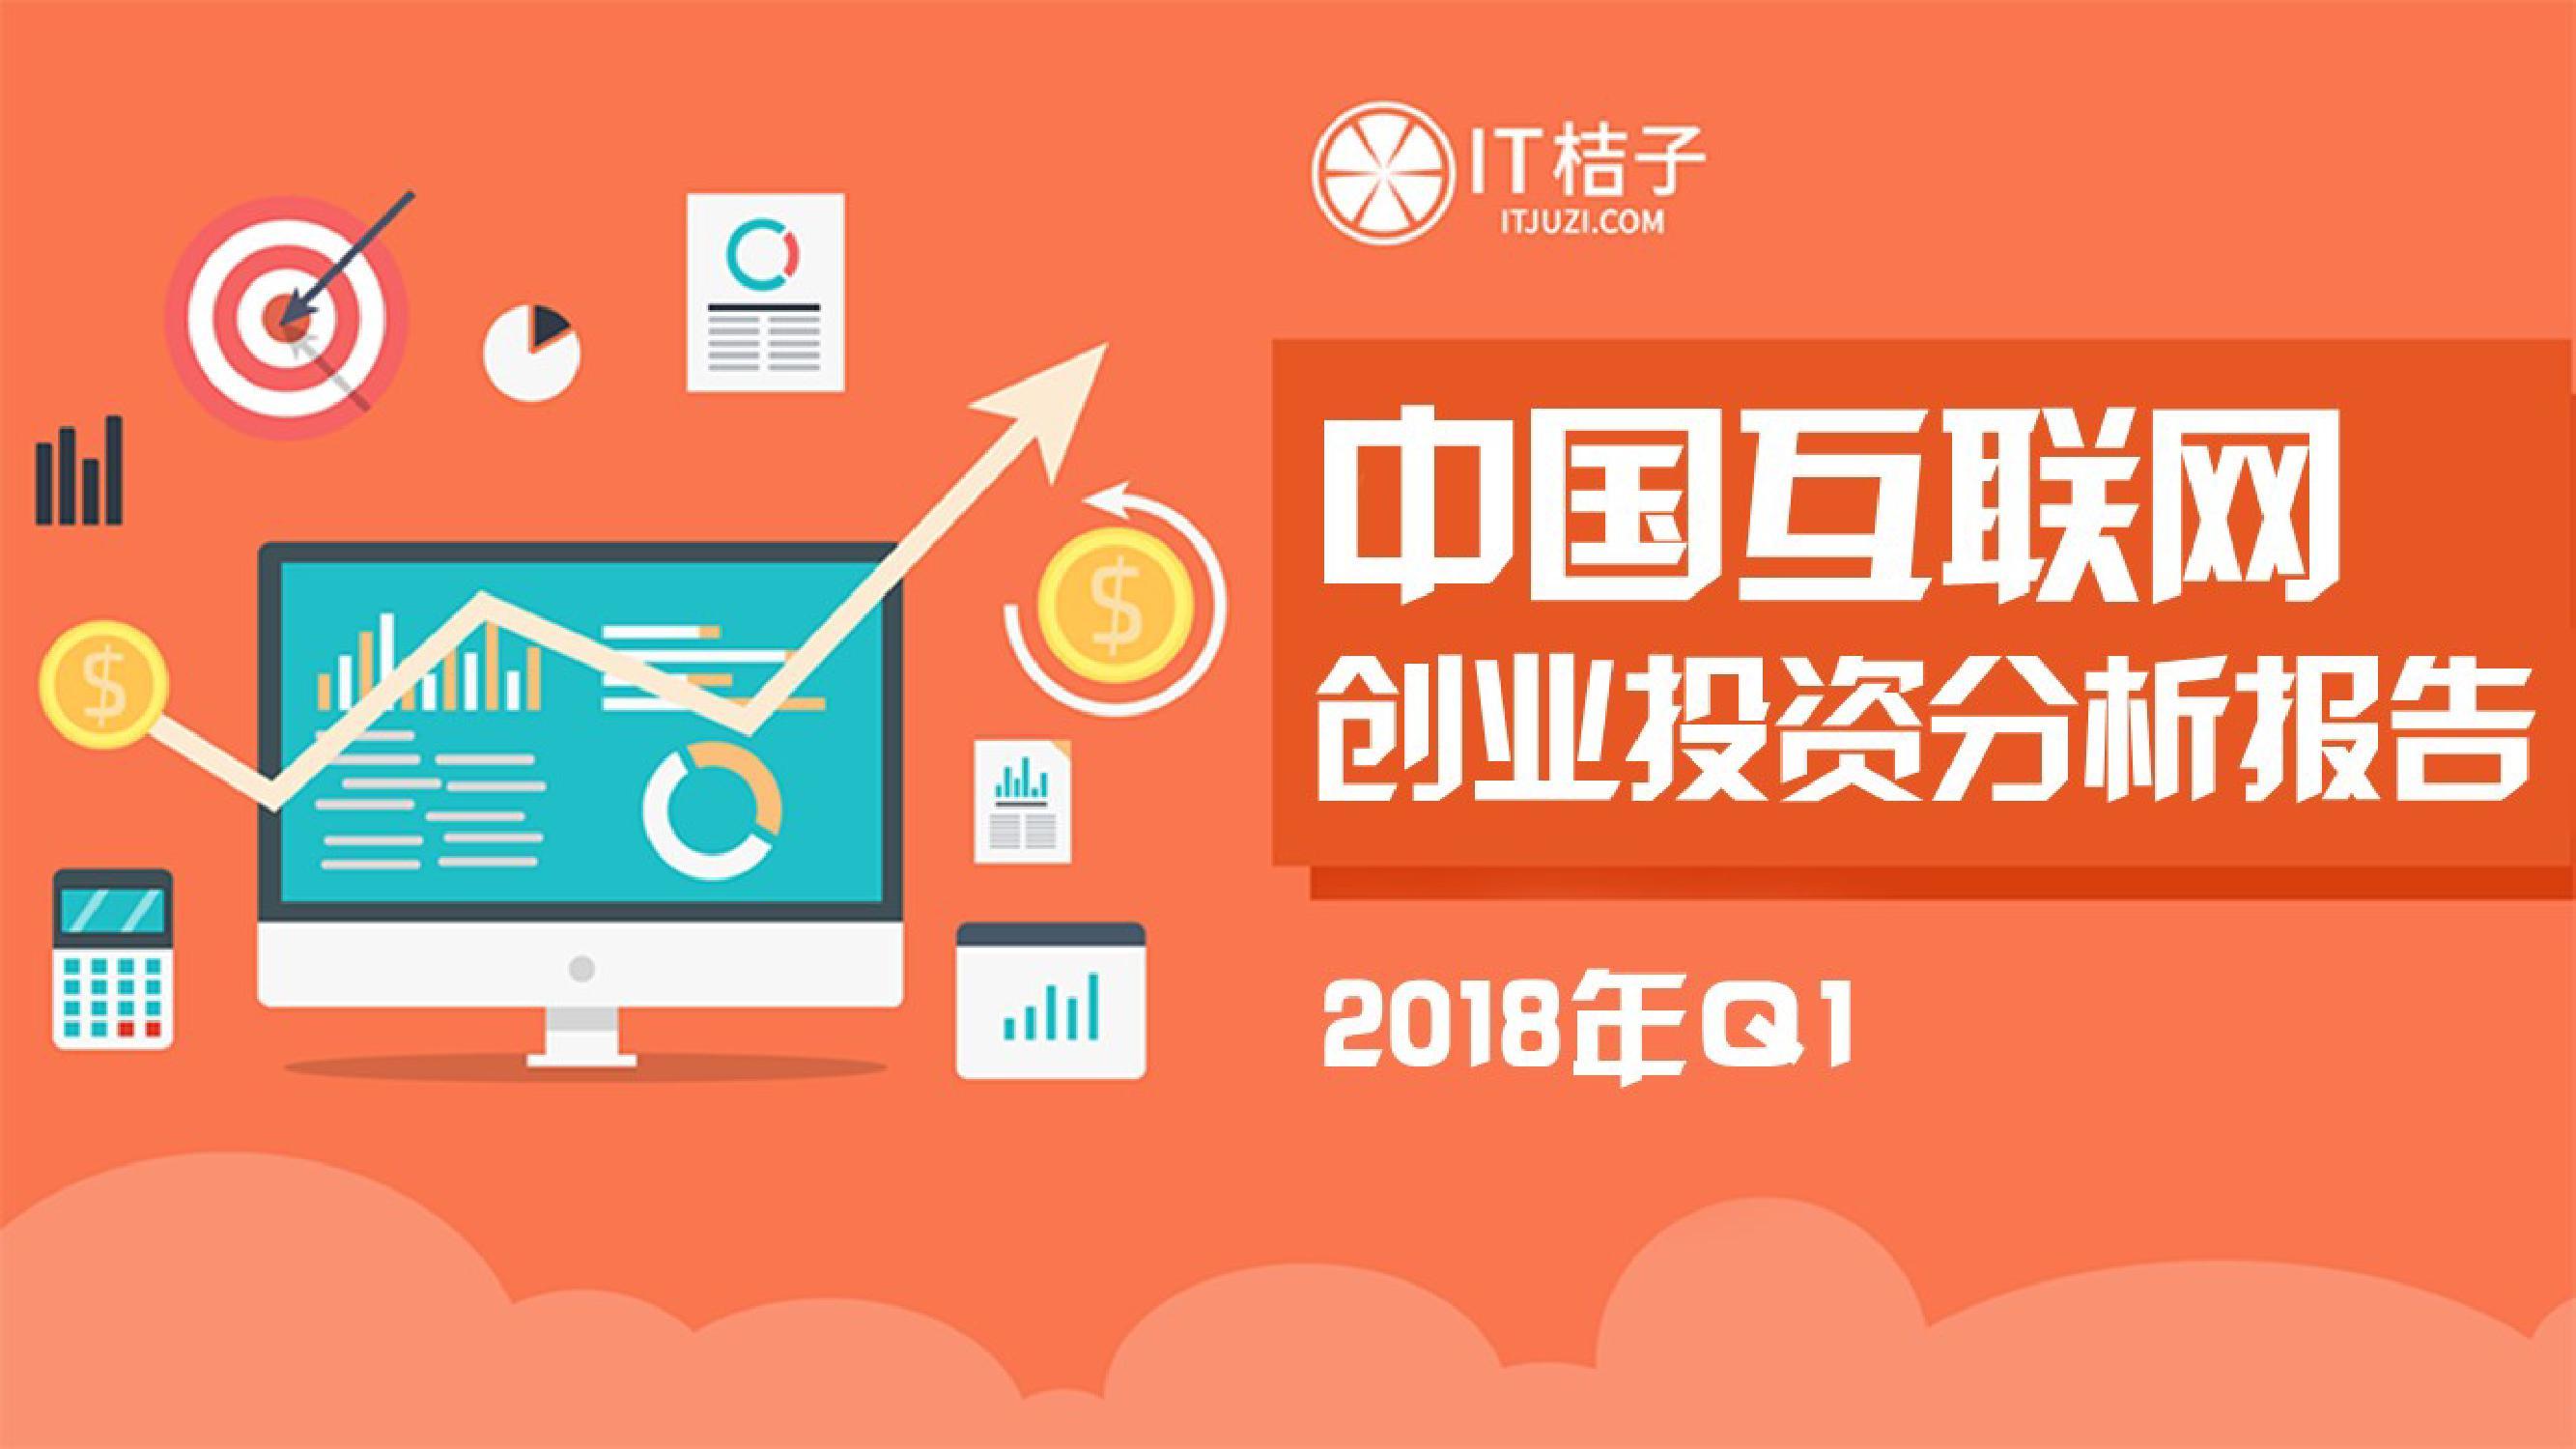 IT桔子:2018年Q1中国互联网创业投资分析报告(附下载)